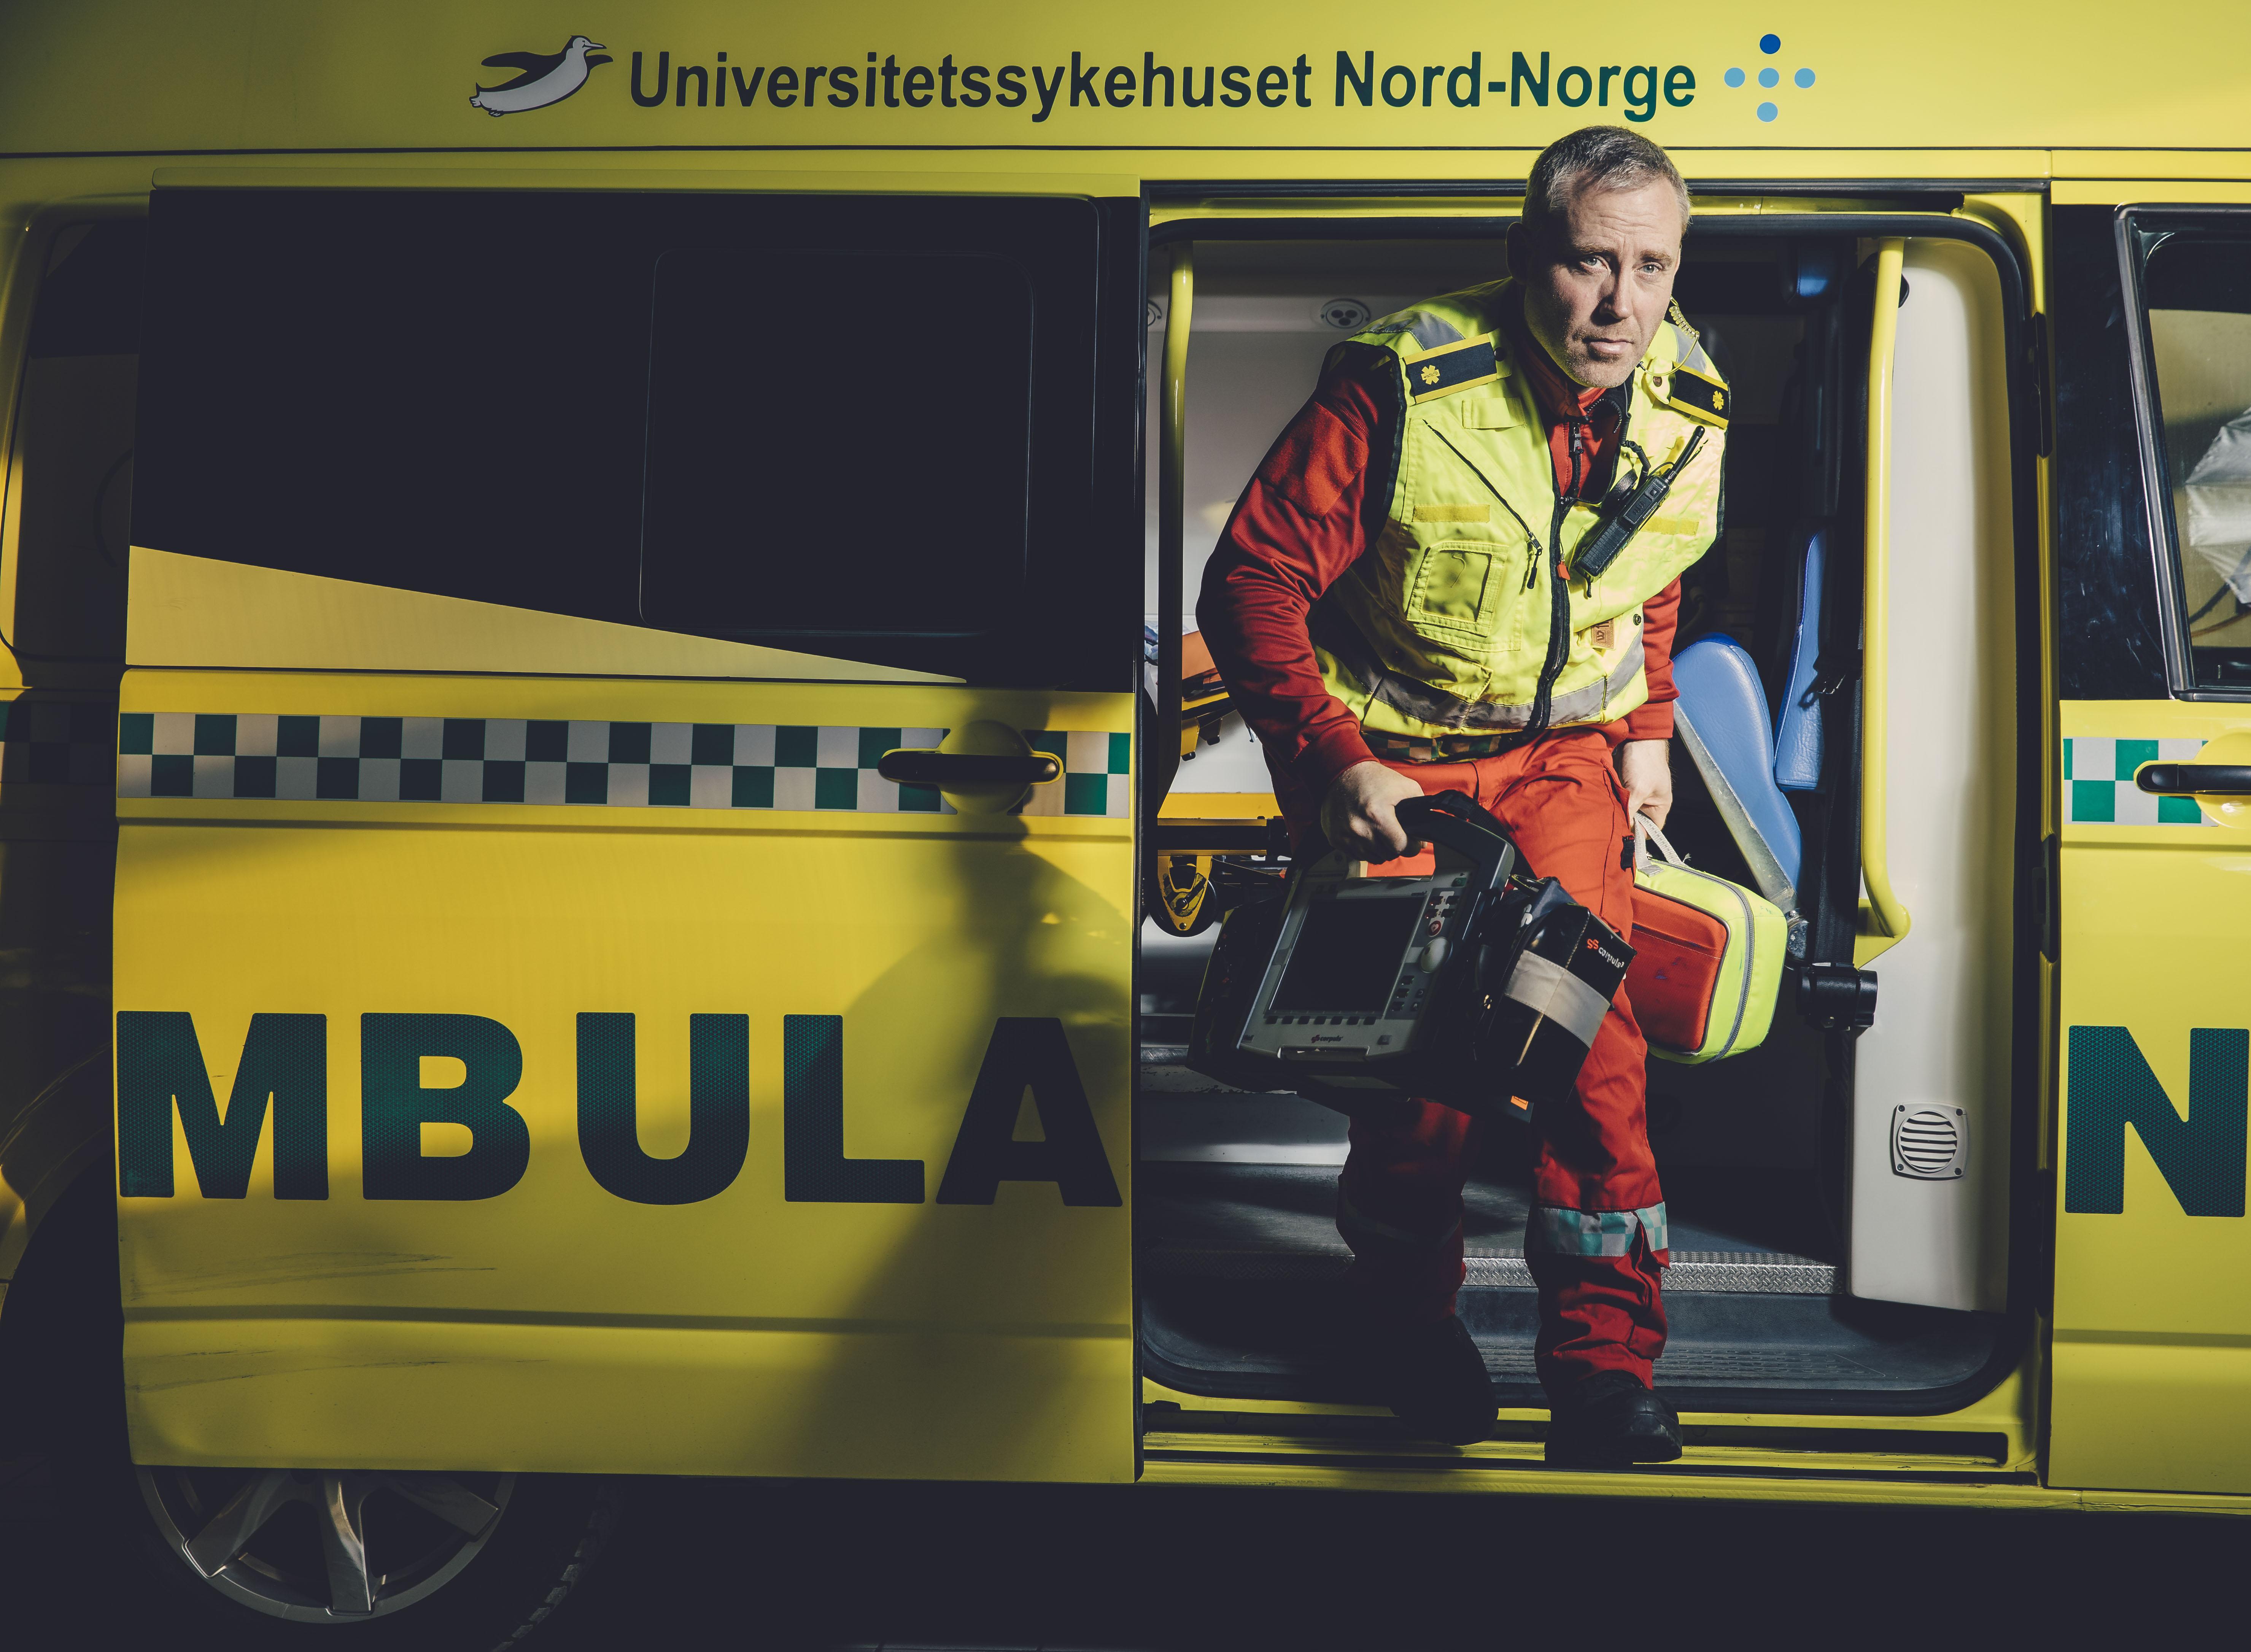 Charles Aune-Lundberg på NRK-serien 113. Foto: Marius Fiskum